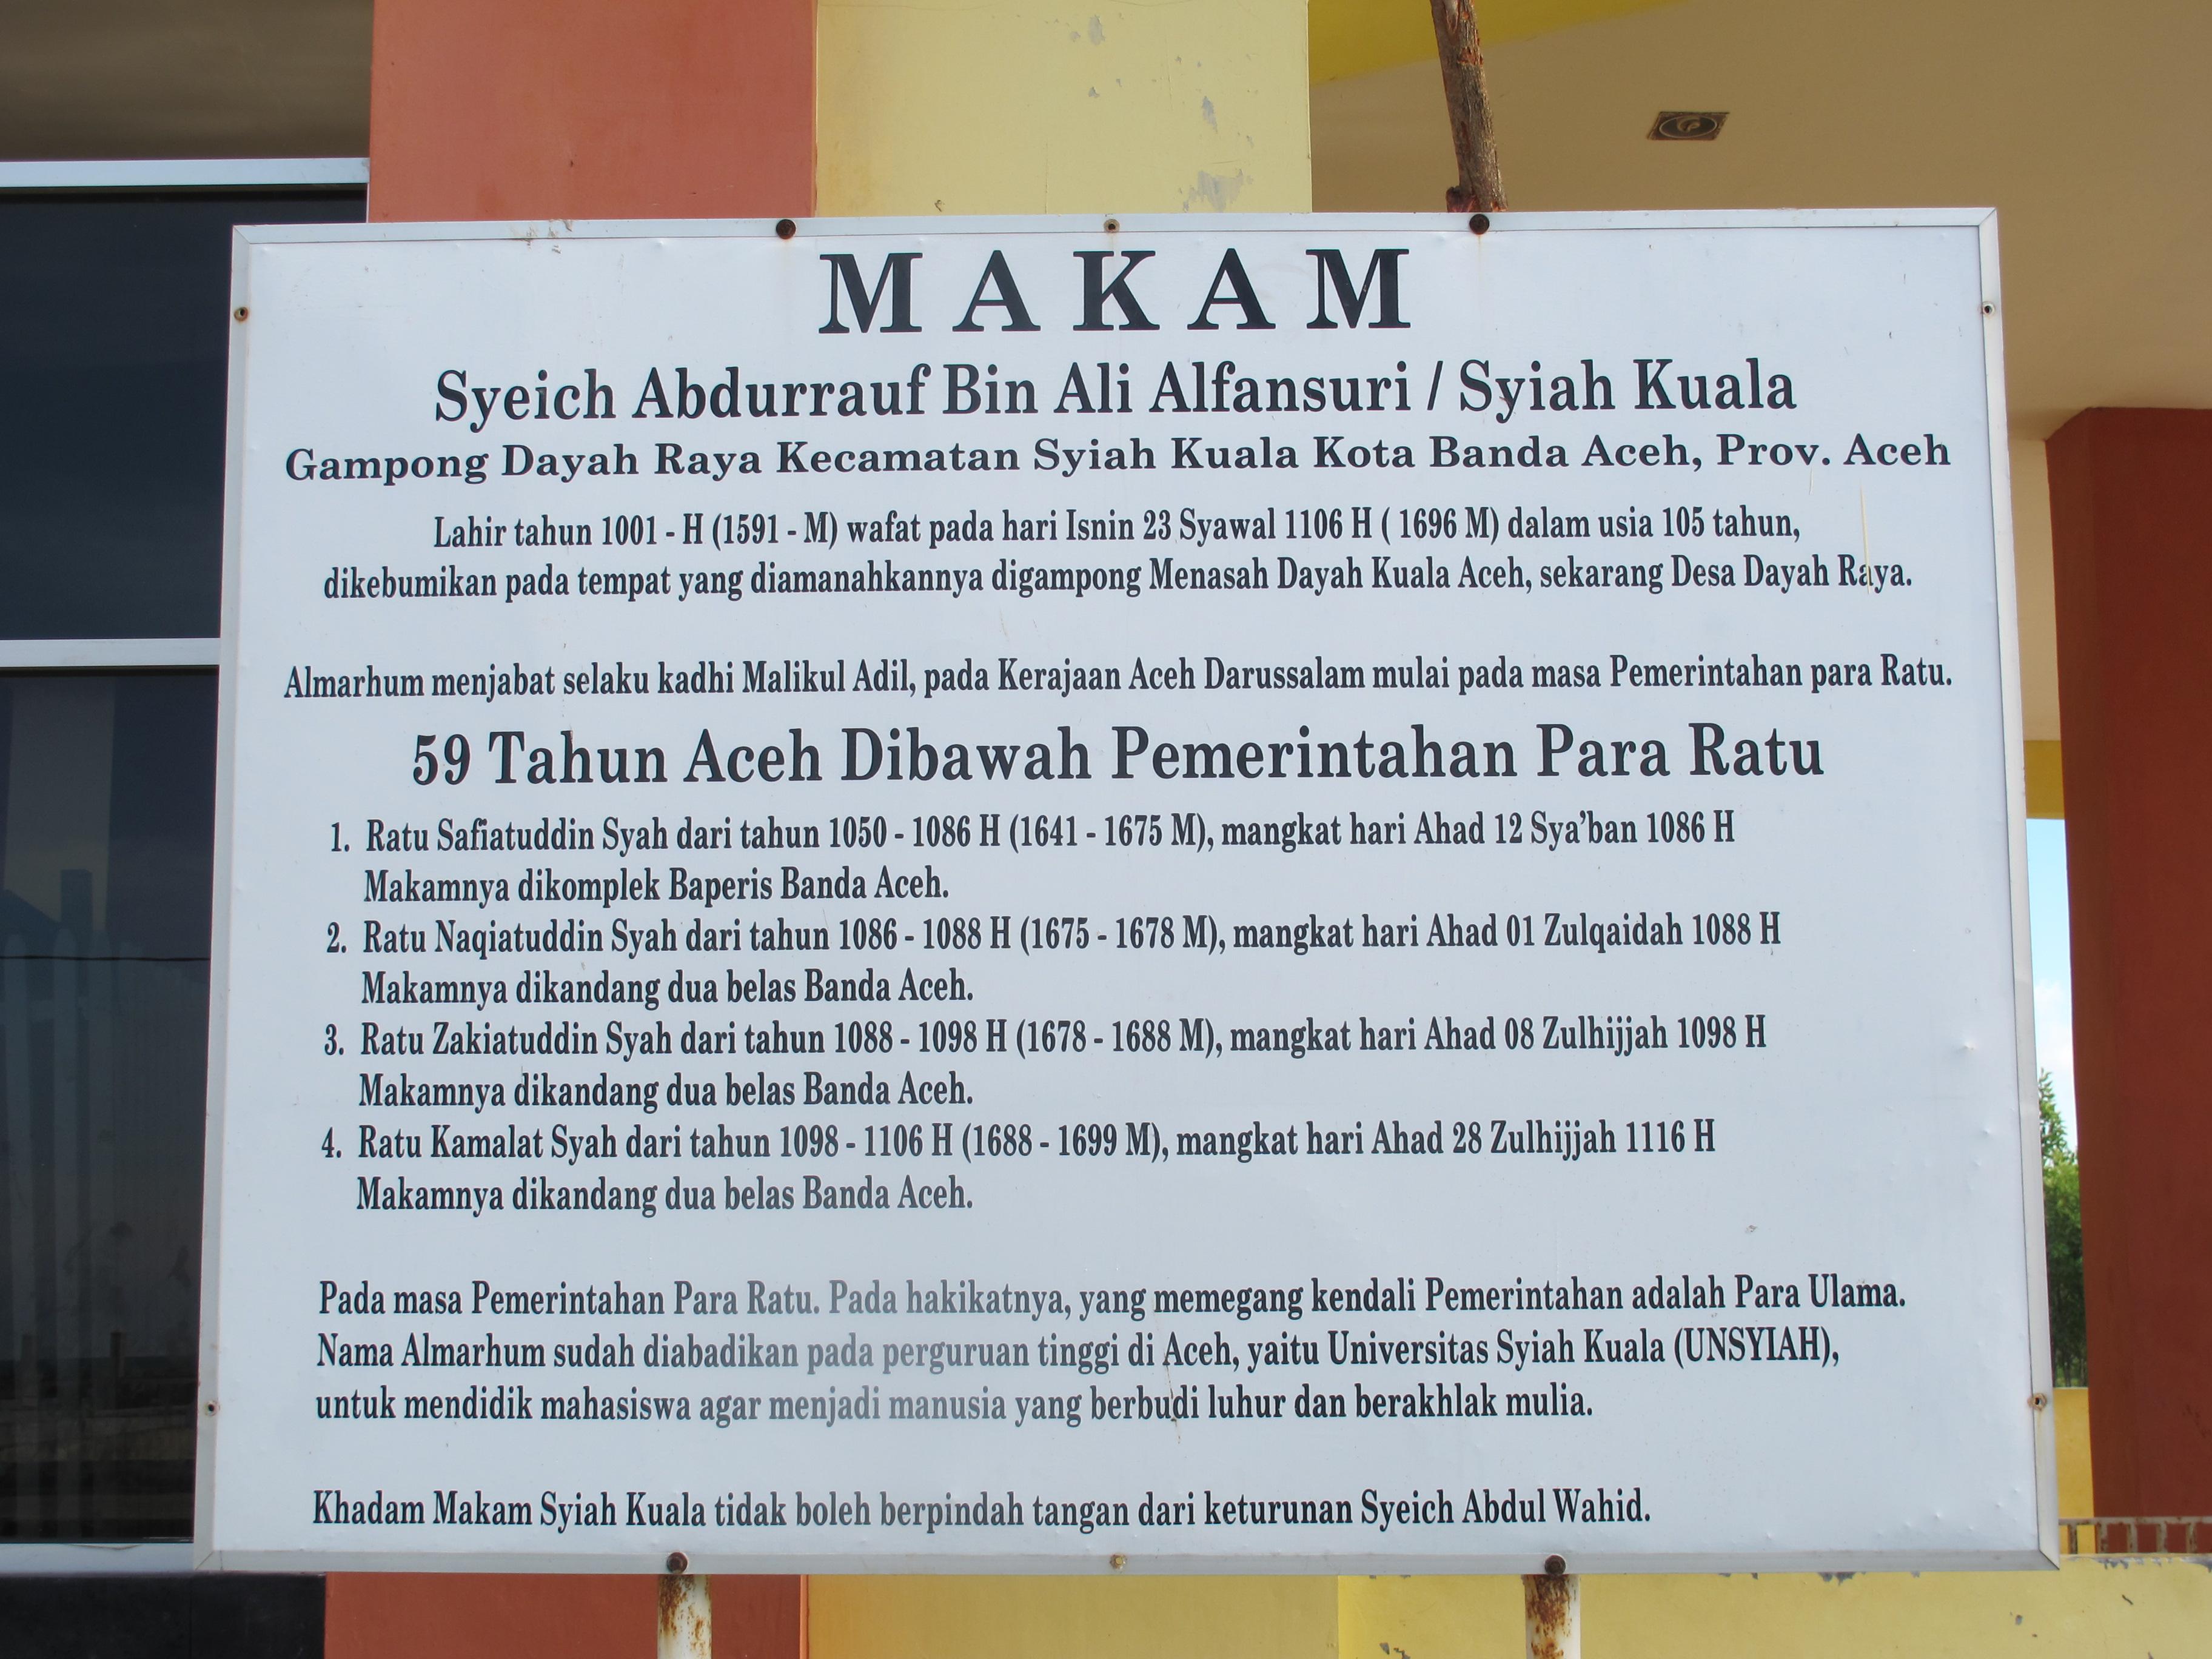 Makam Teungku Syiah Kuala Banda Aceh Kota